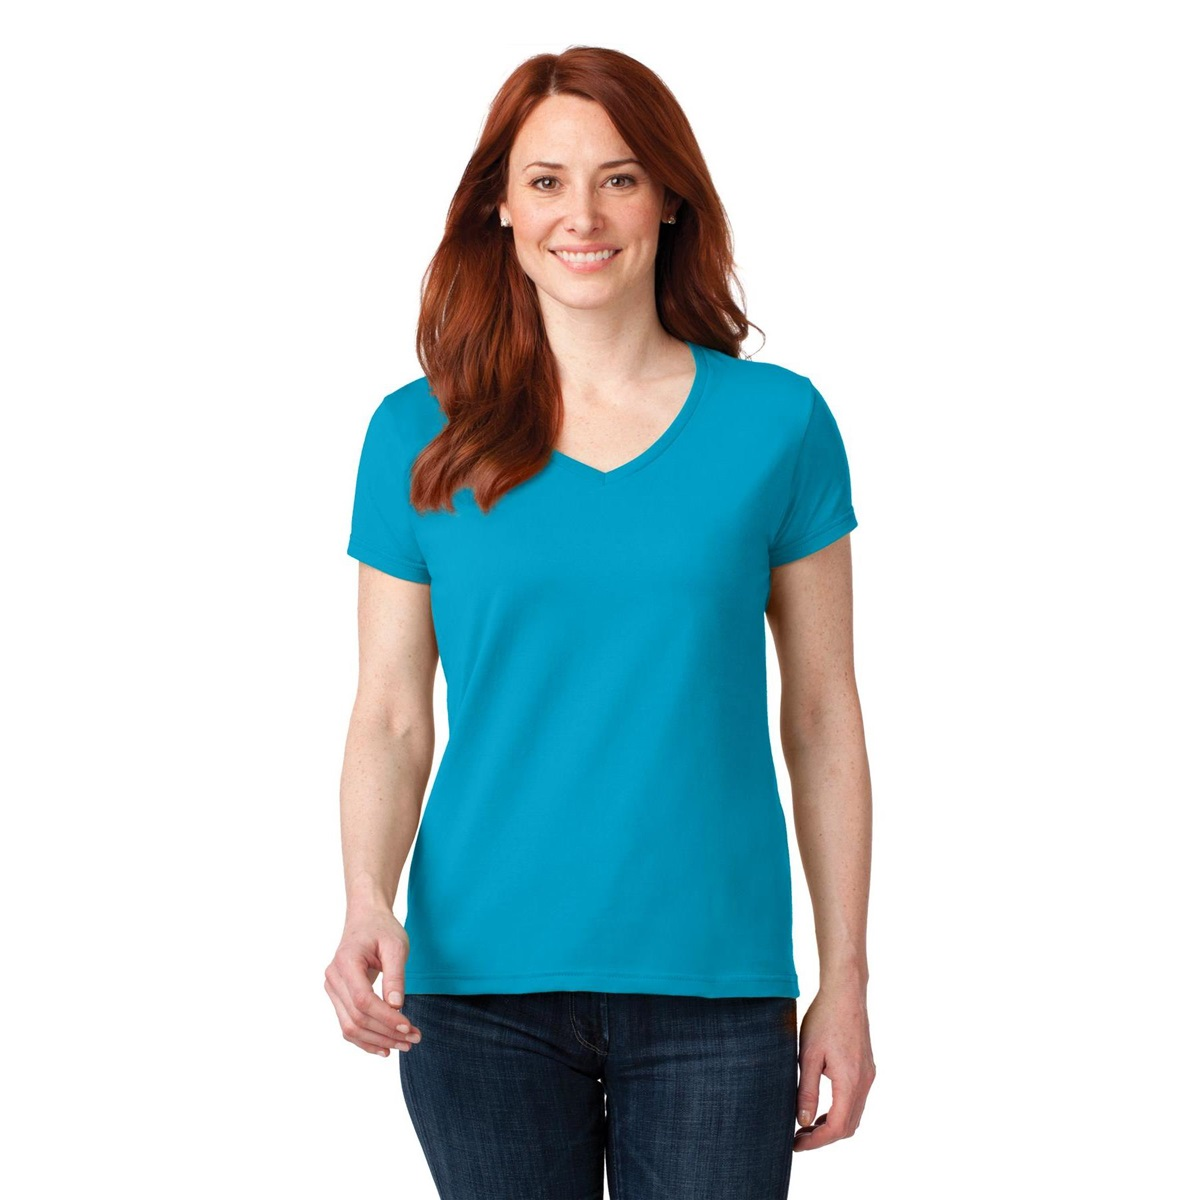 Anvil 88vl ladies 100 ring spun cotton v neck t shirt for Where are anvil shirts made